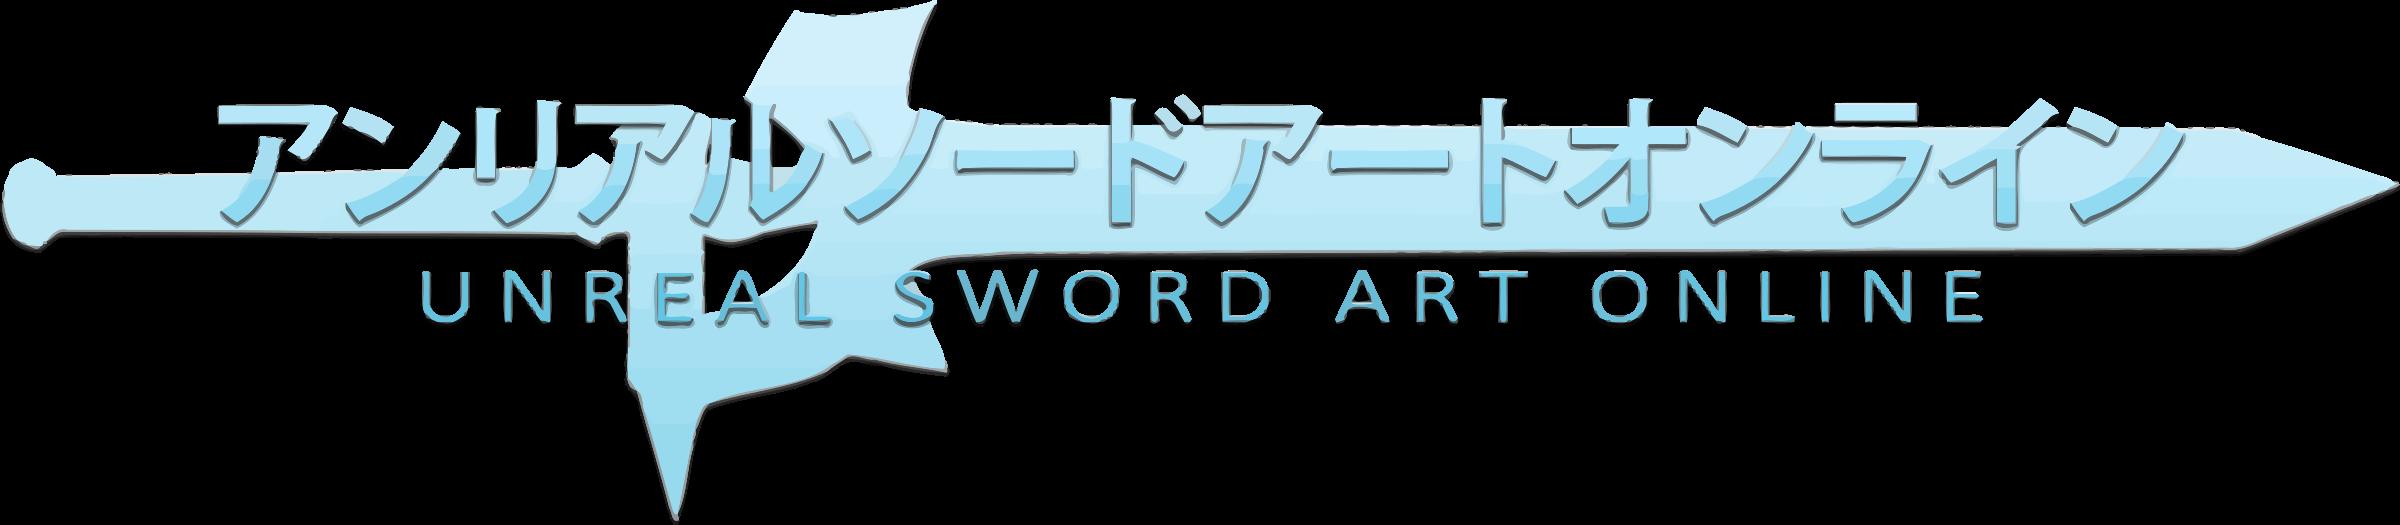 clip art royalty free download Sword Art Online Logo PNG Transparent